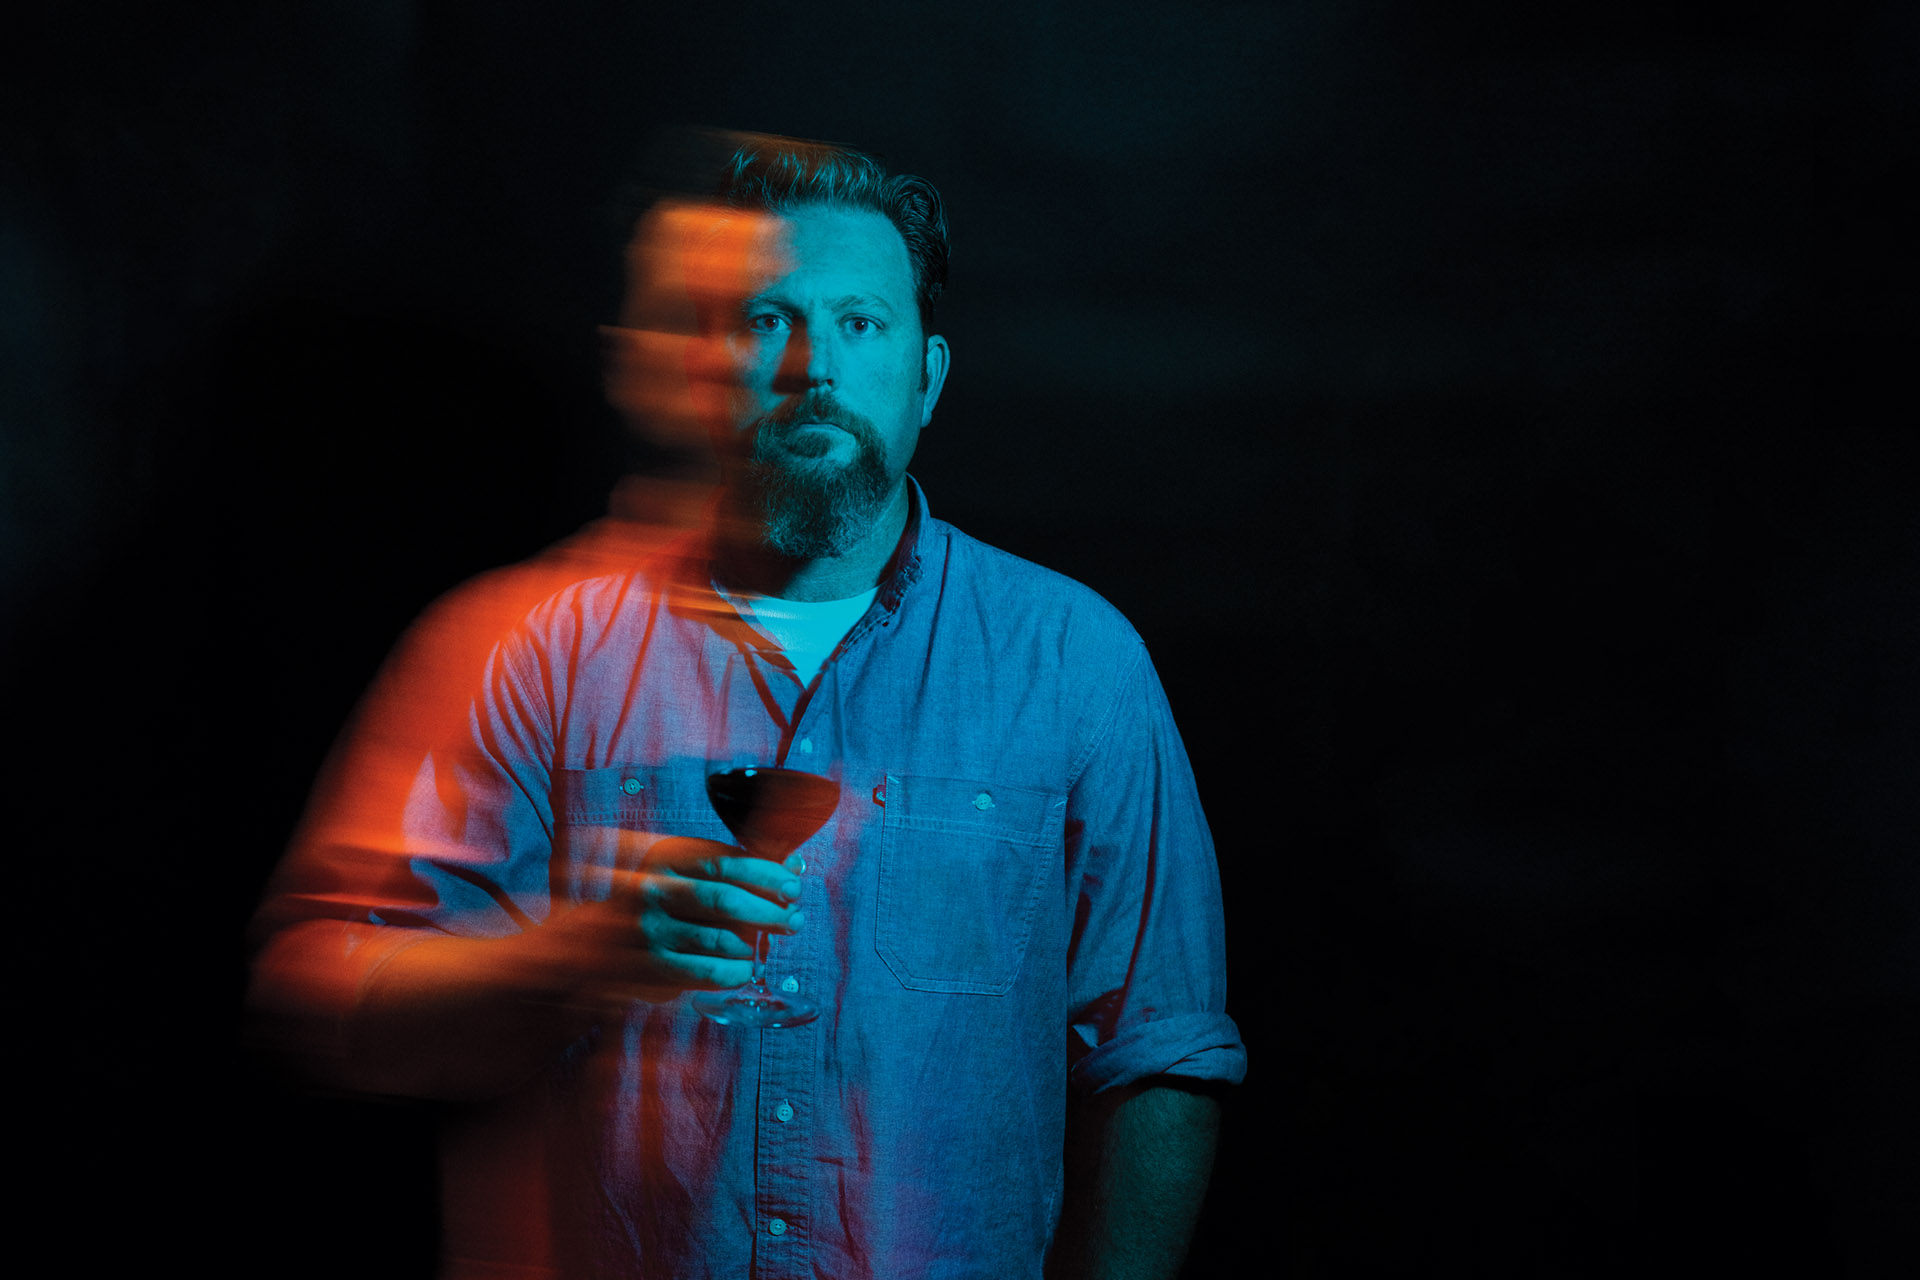 Herb Quady holding wine glass